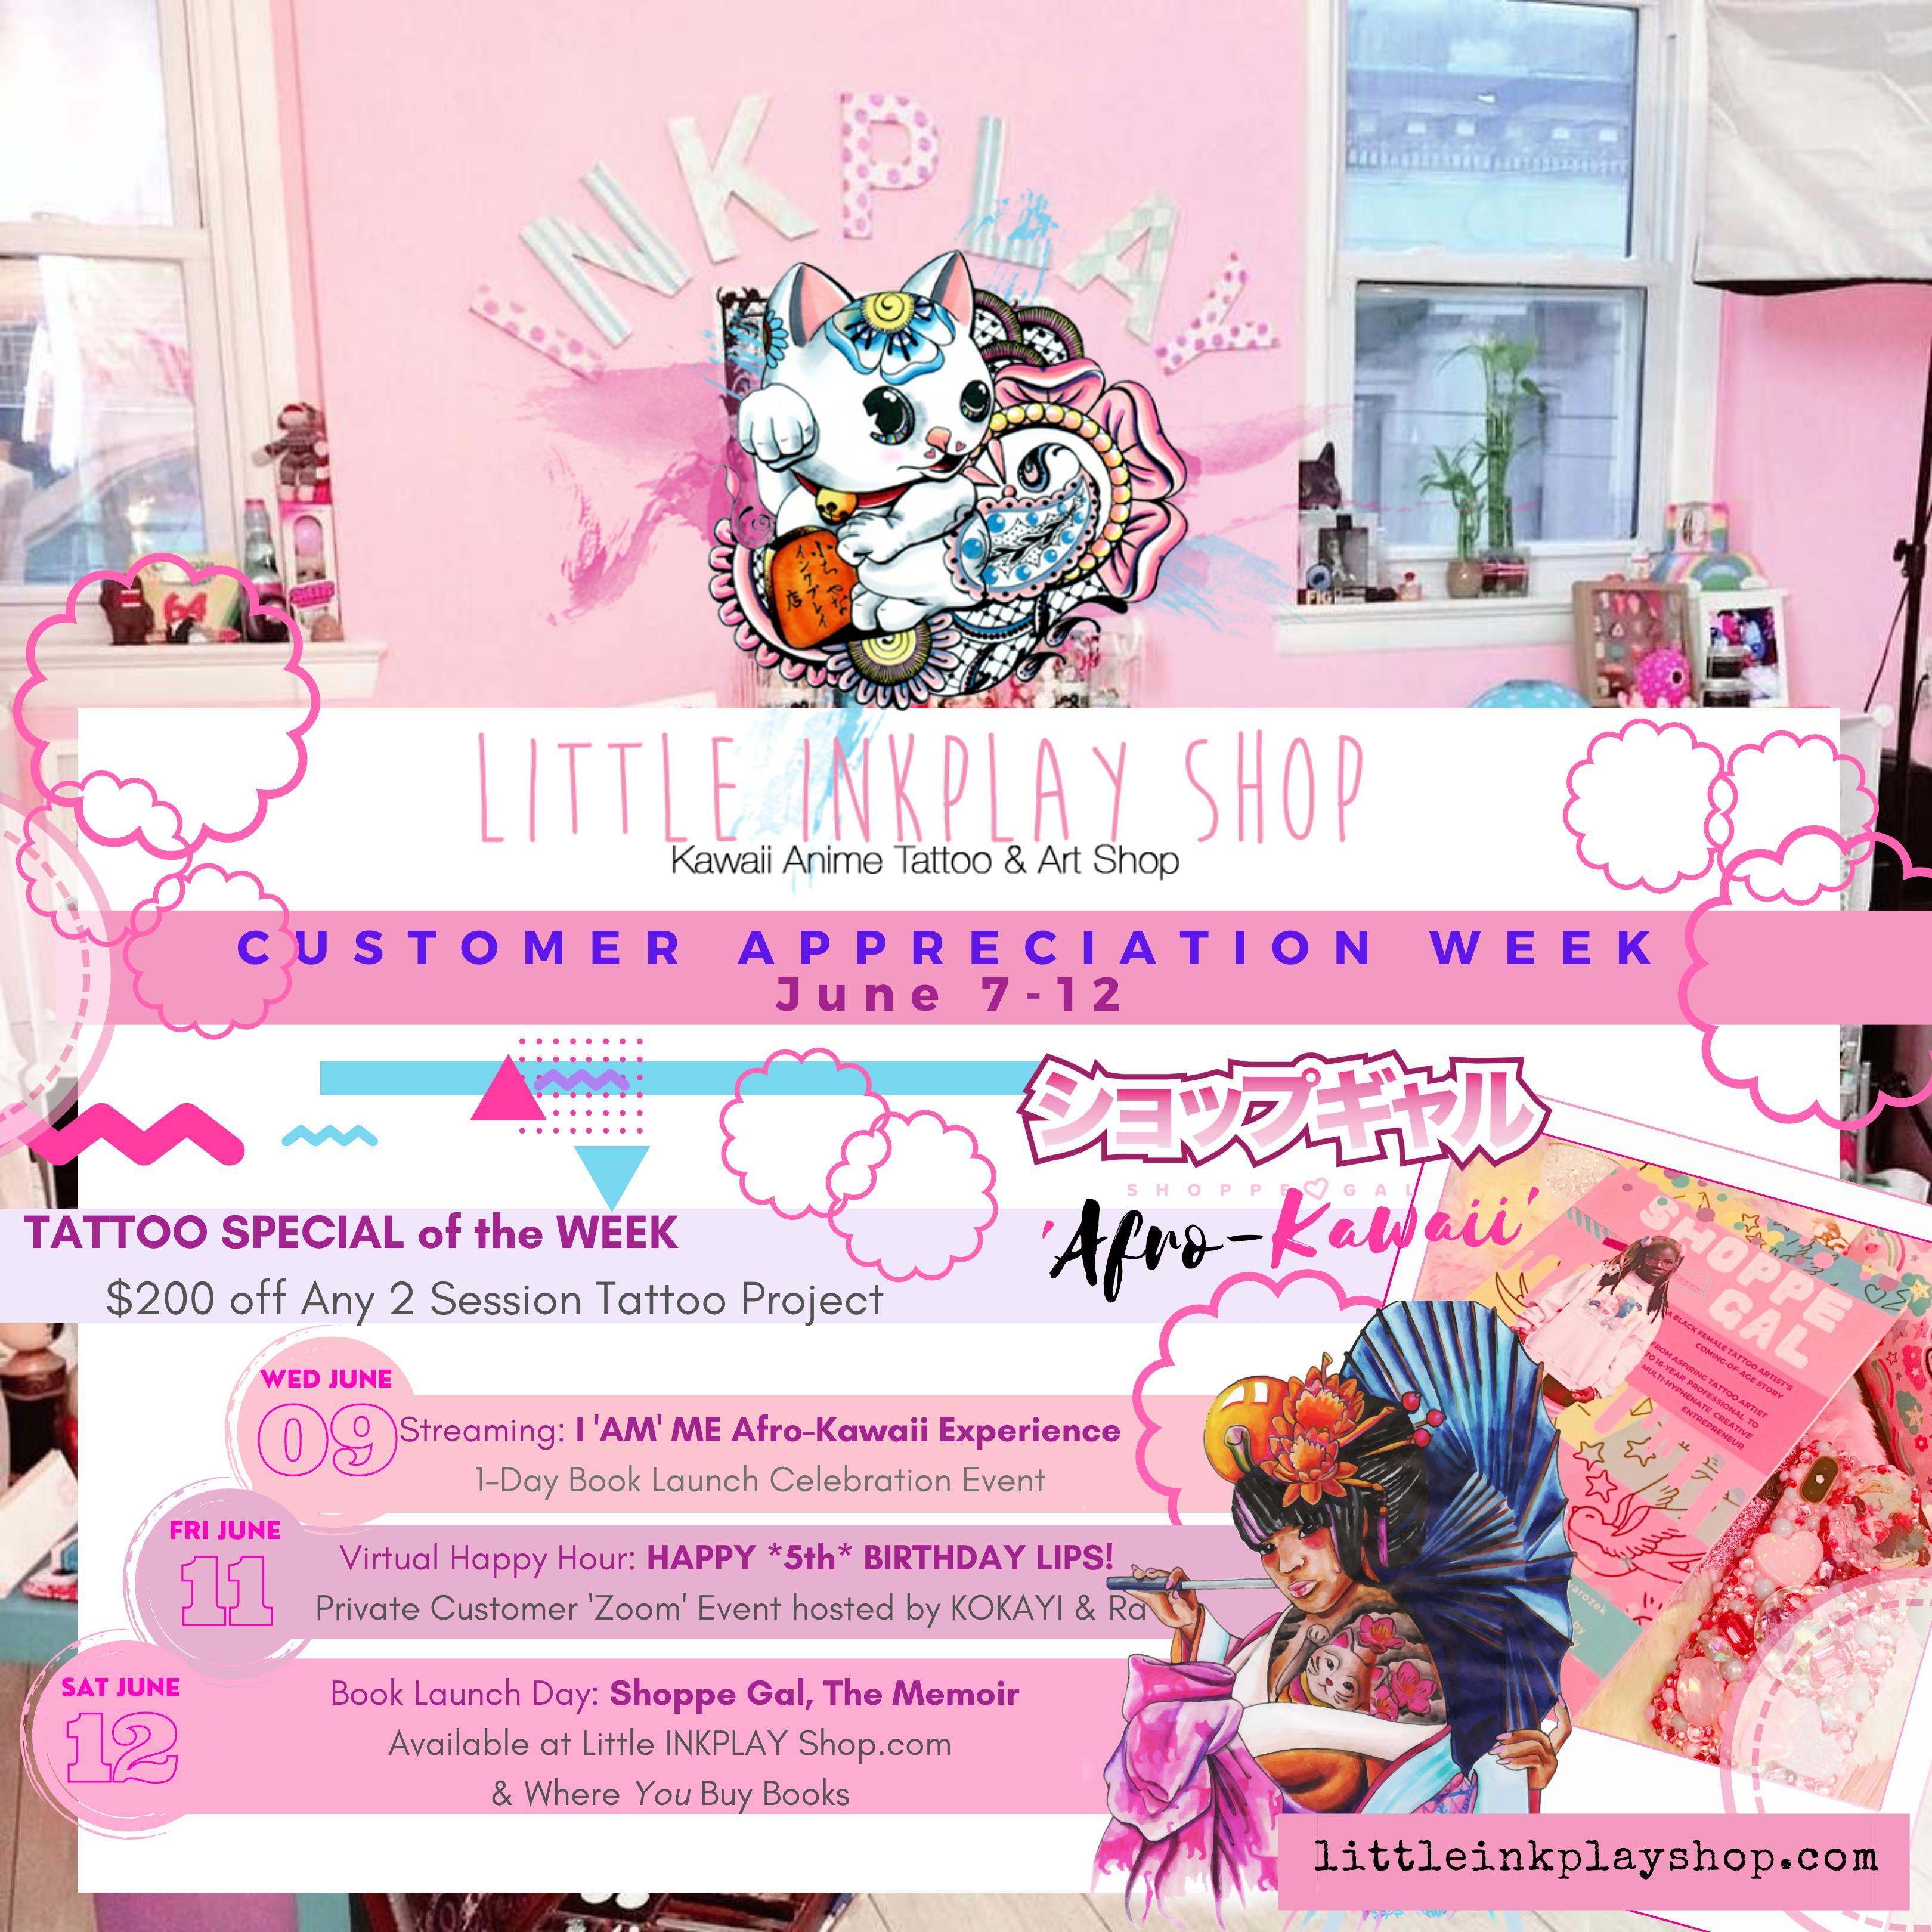 Customer Appreciation Week 2021, June 7-12